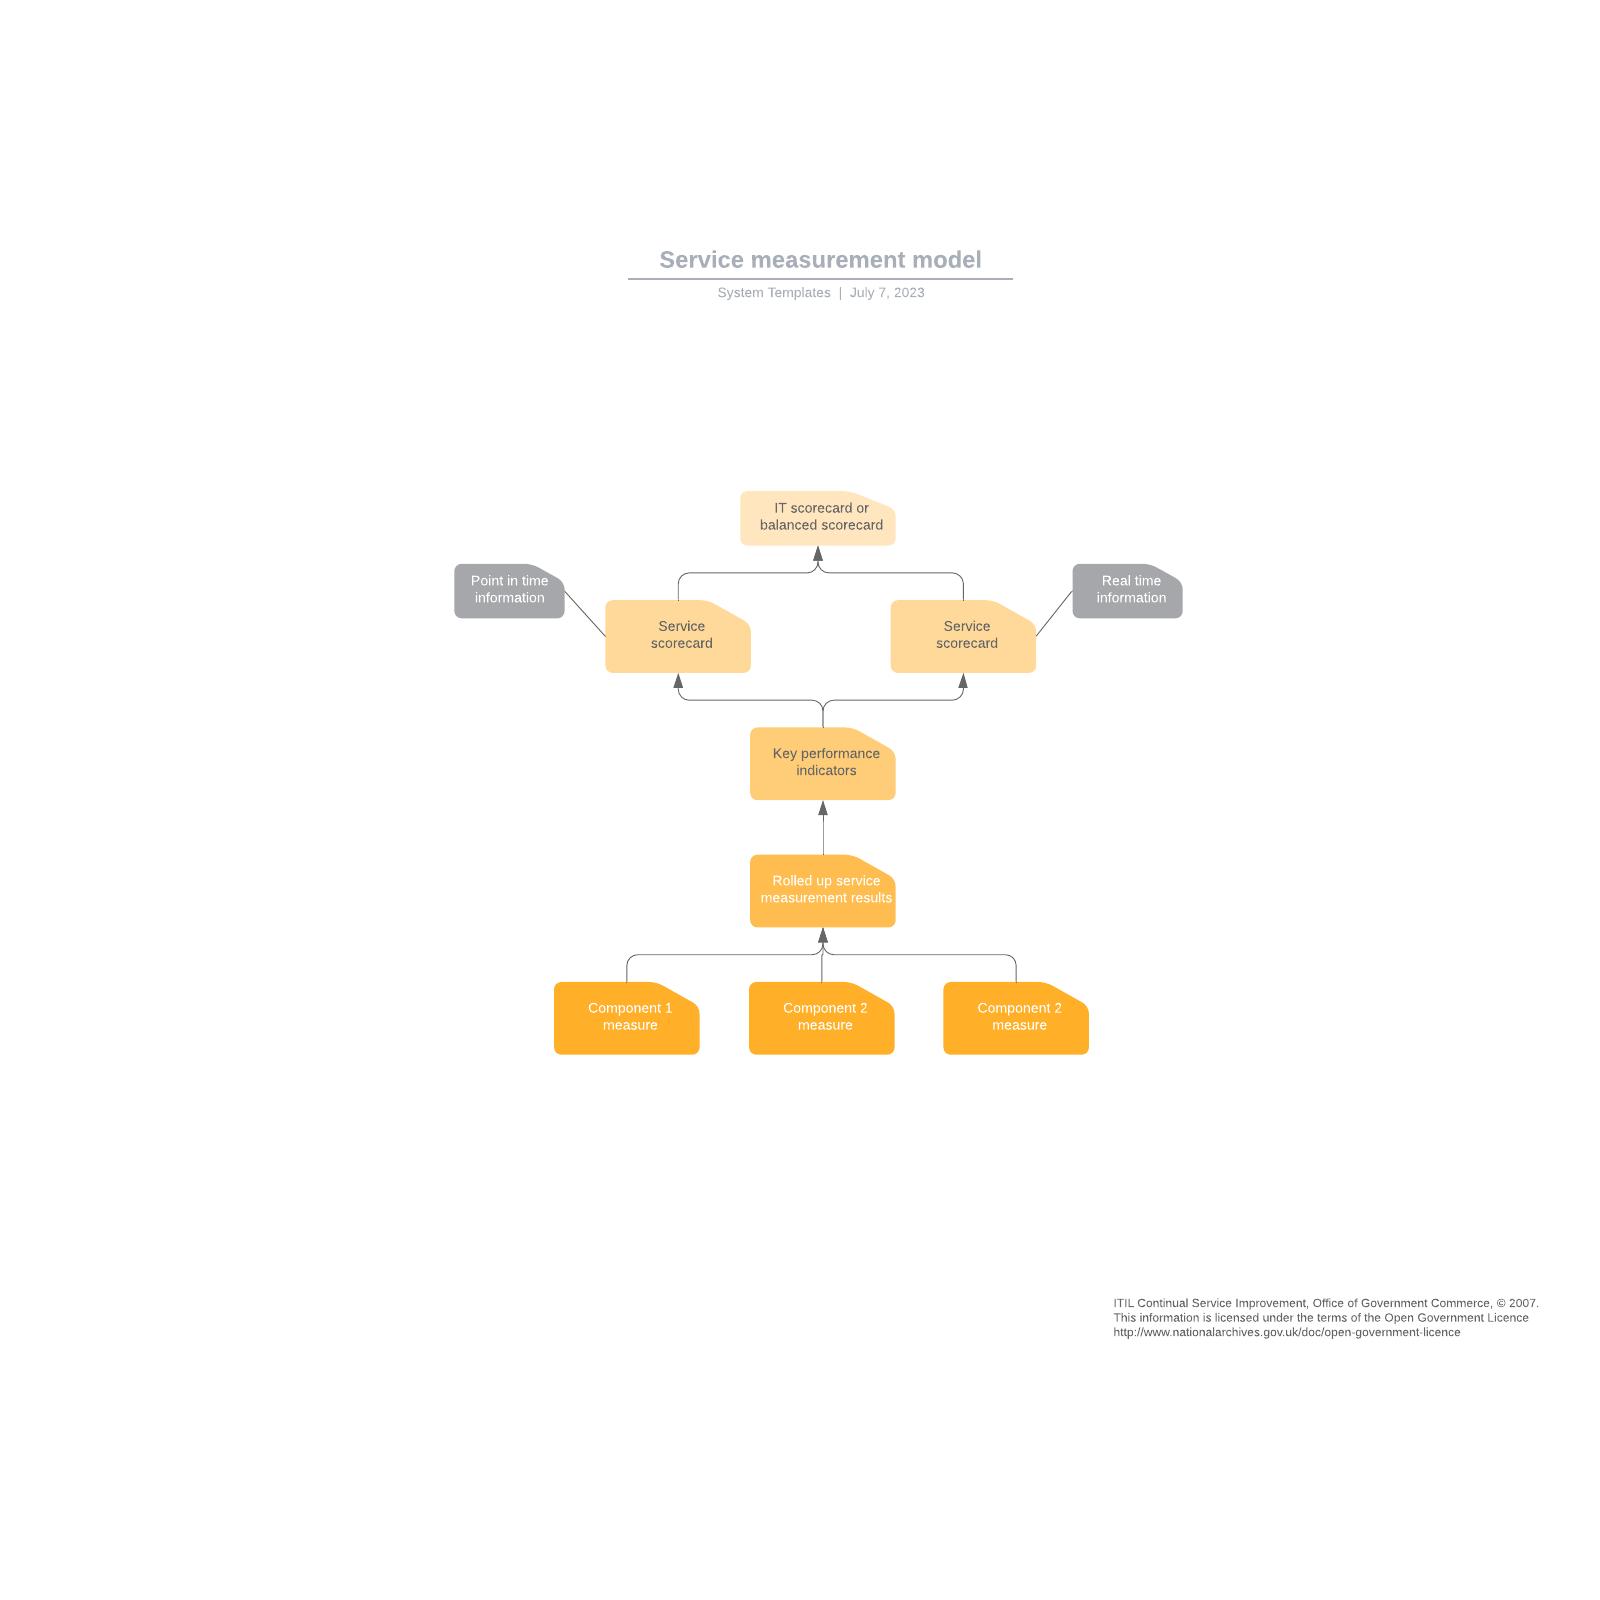 Service measurement model